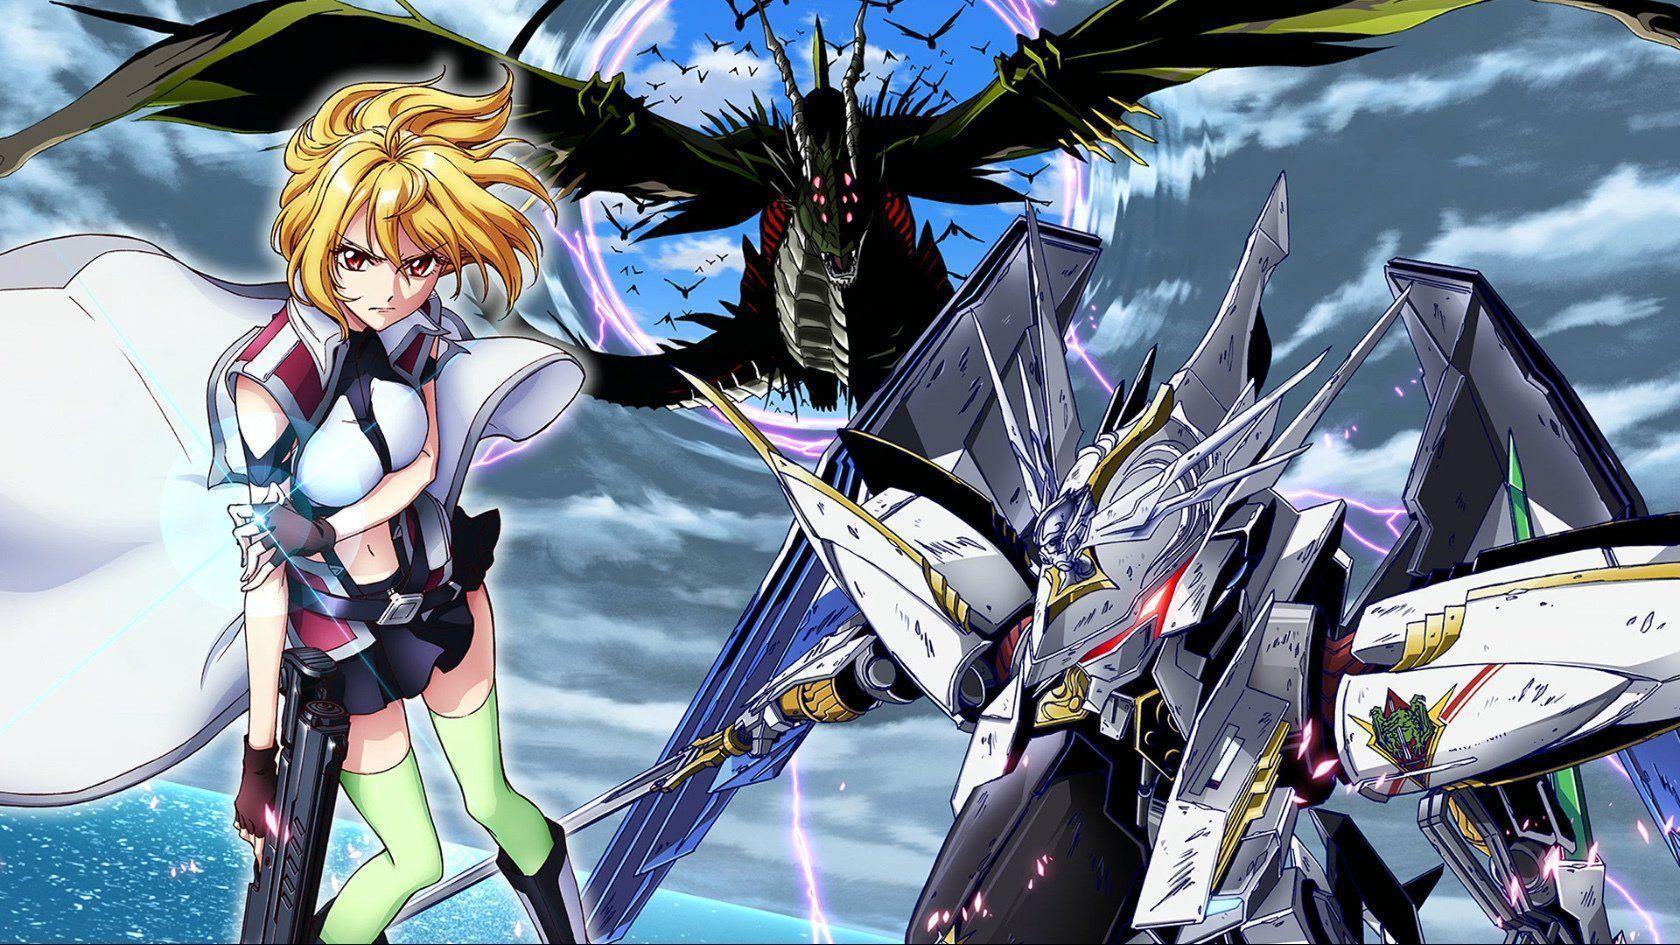 Dark anime like 86 (Eighty Six) Cross Ange Rondo of Angel and Dragon